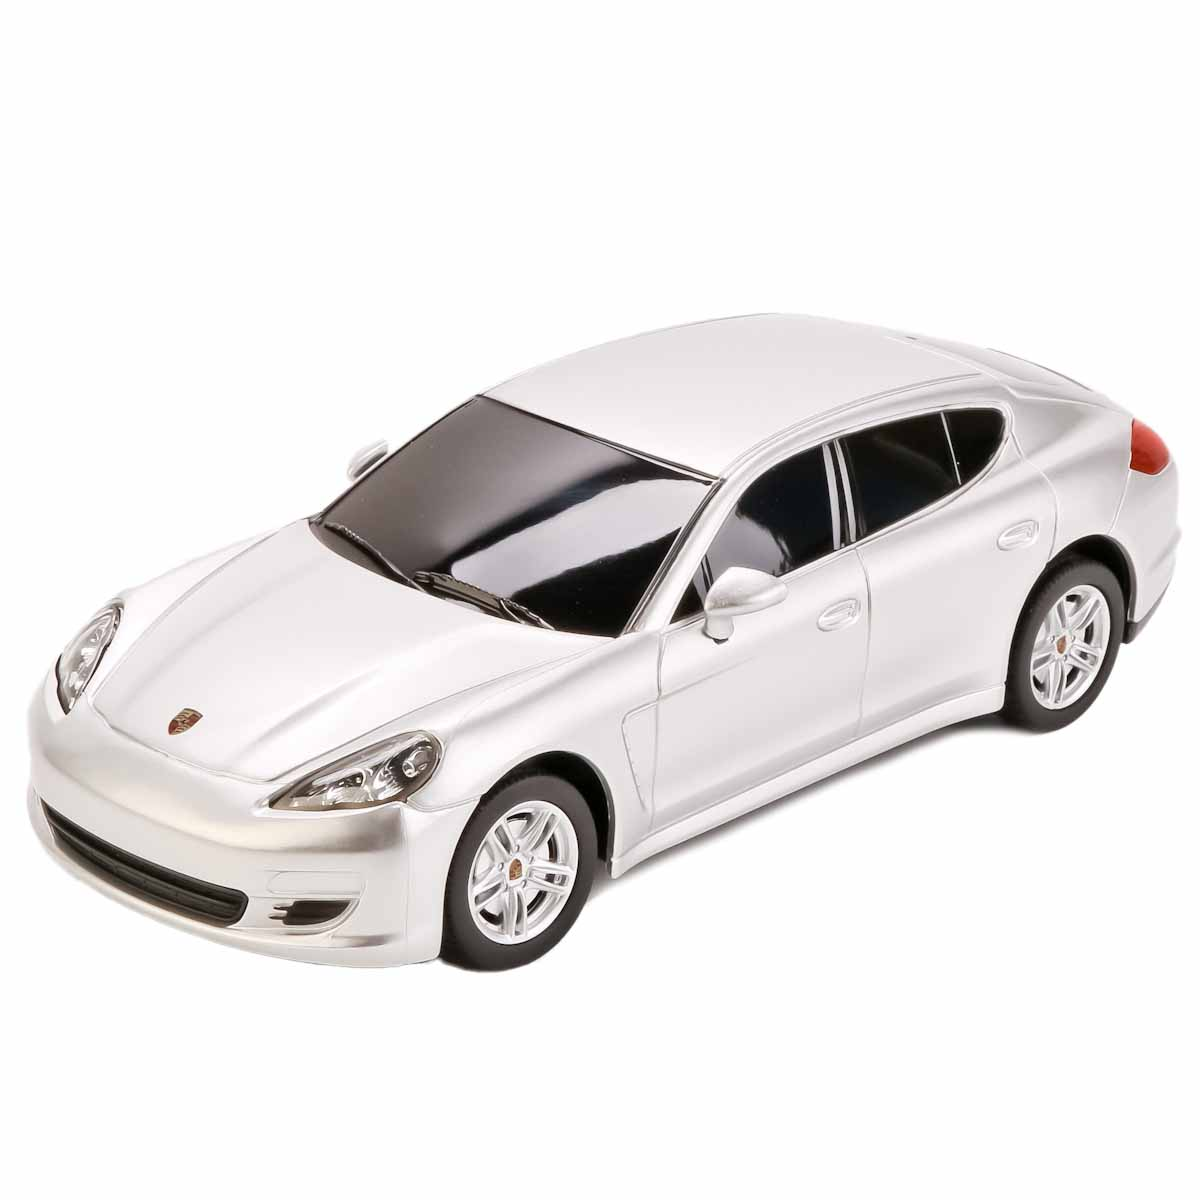 Rastar Машина на радиоуправлении Porsche Panamera